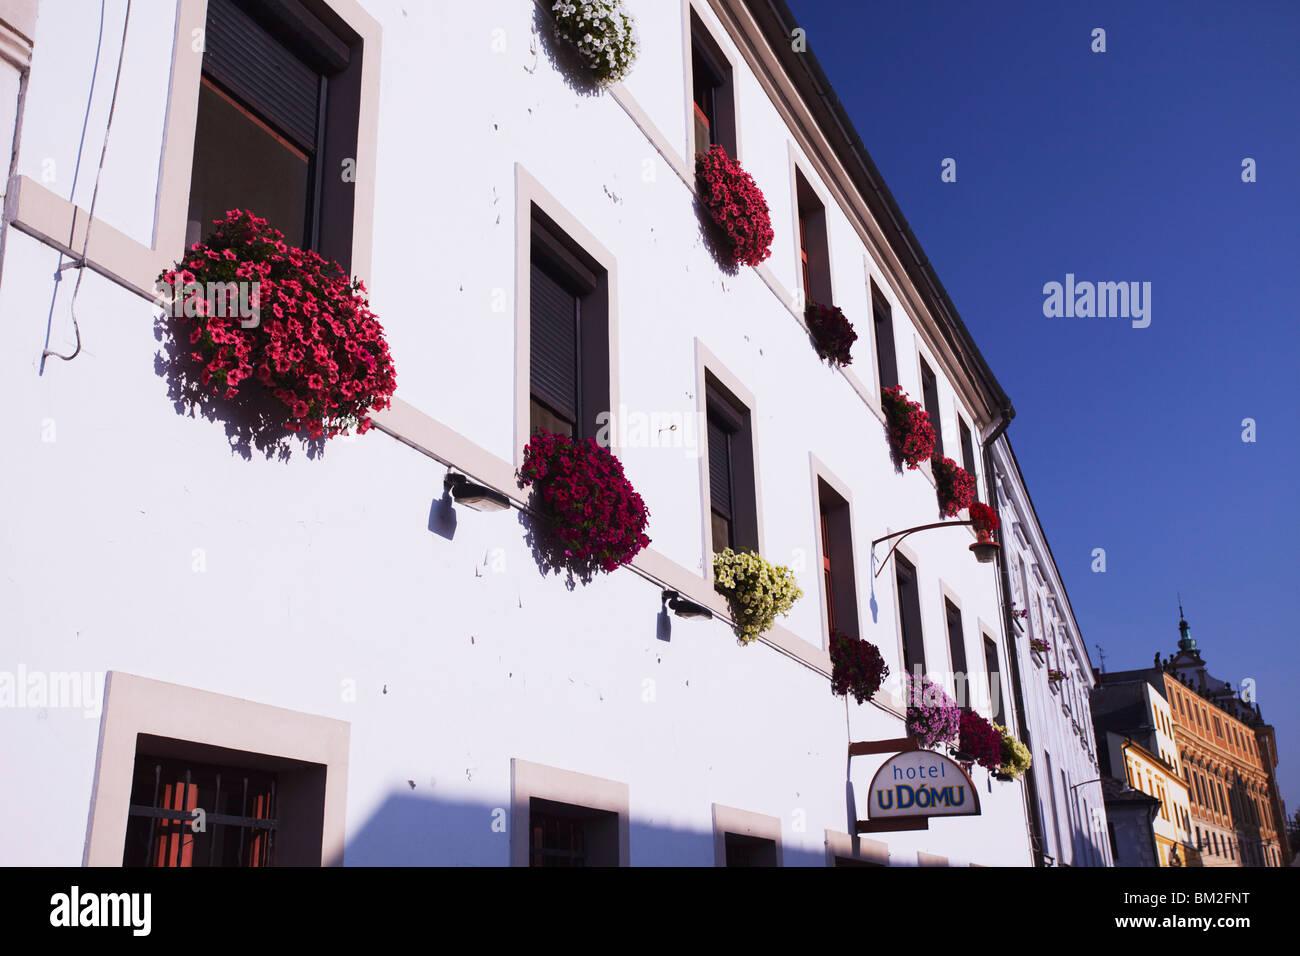 Colourful flowers on facade of hotel, Olomouc, Moravia, Czech Republic - Stock Image